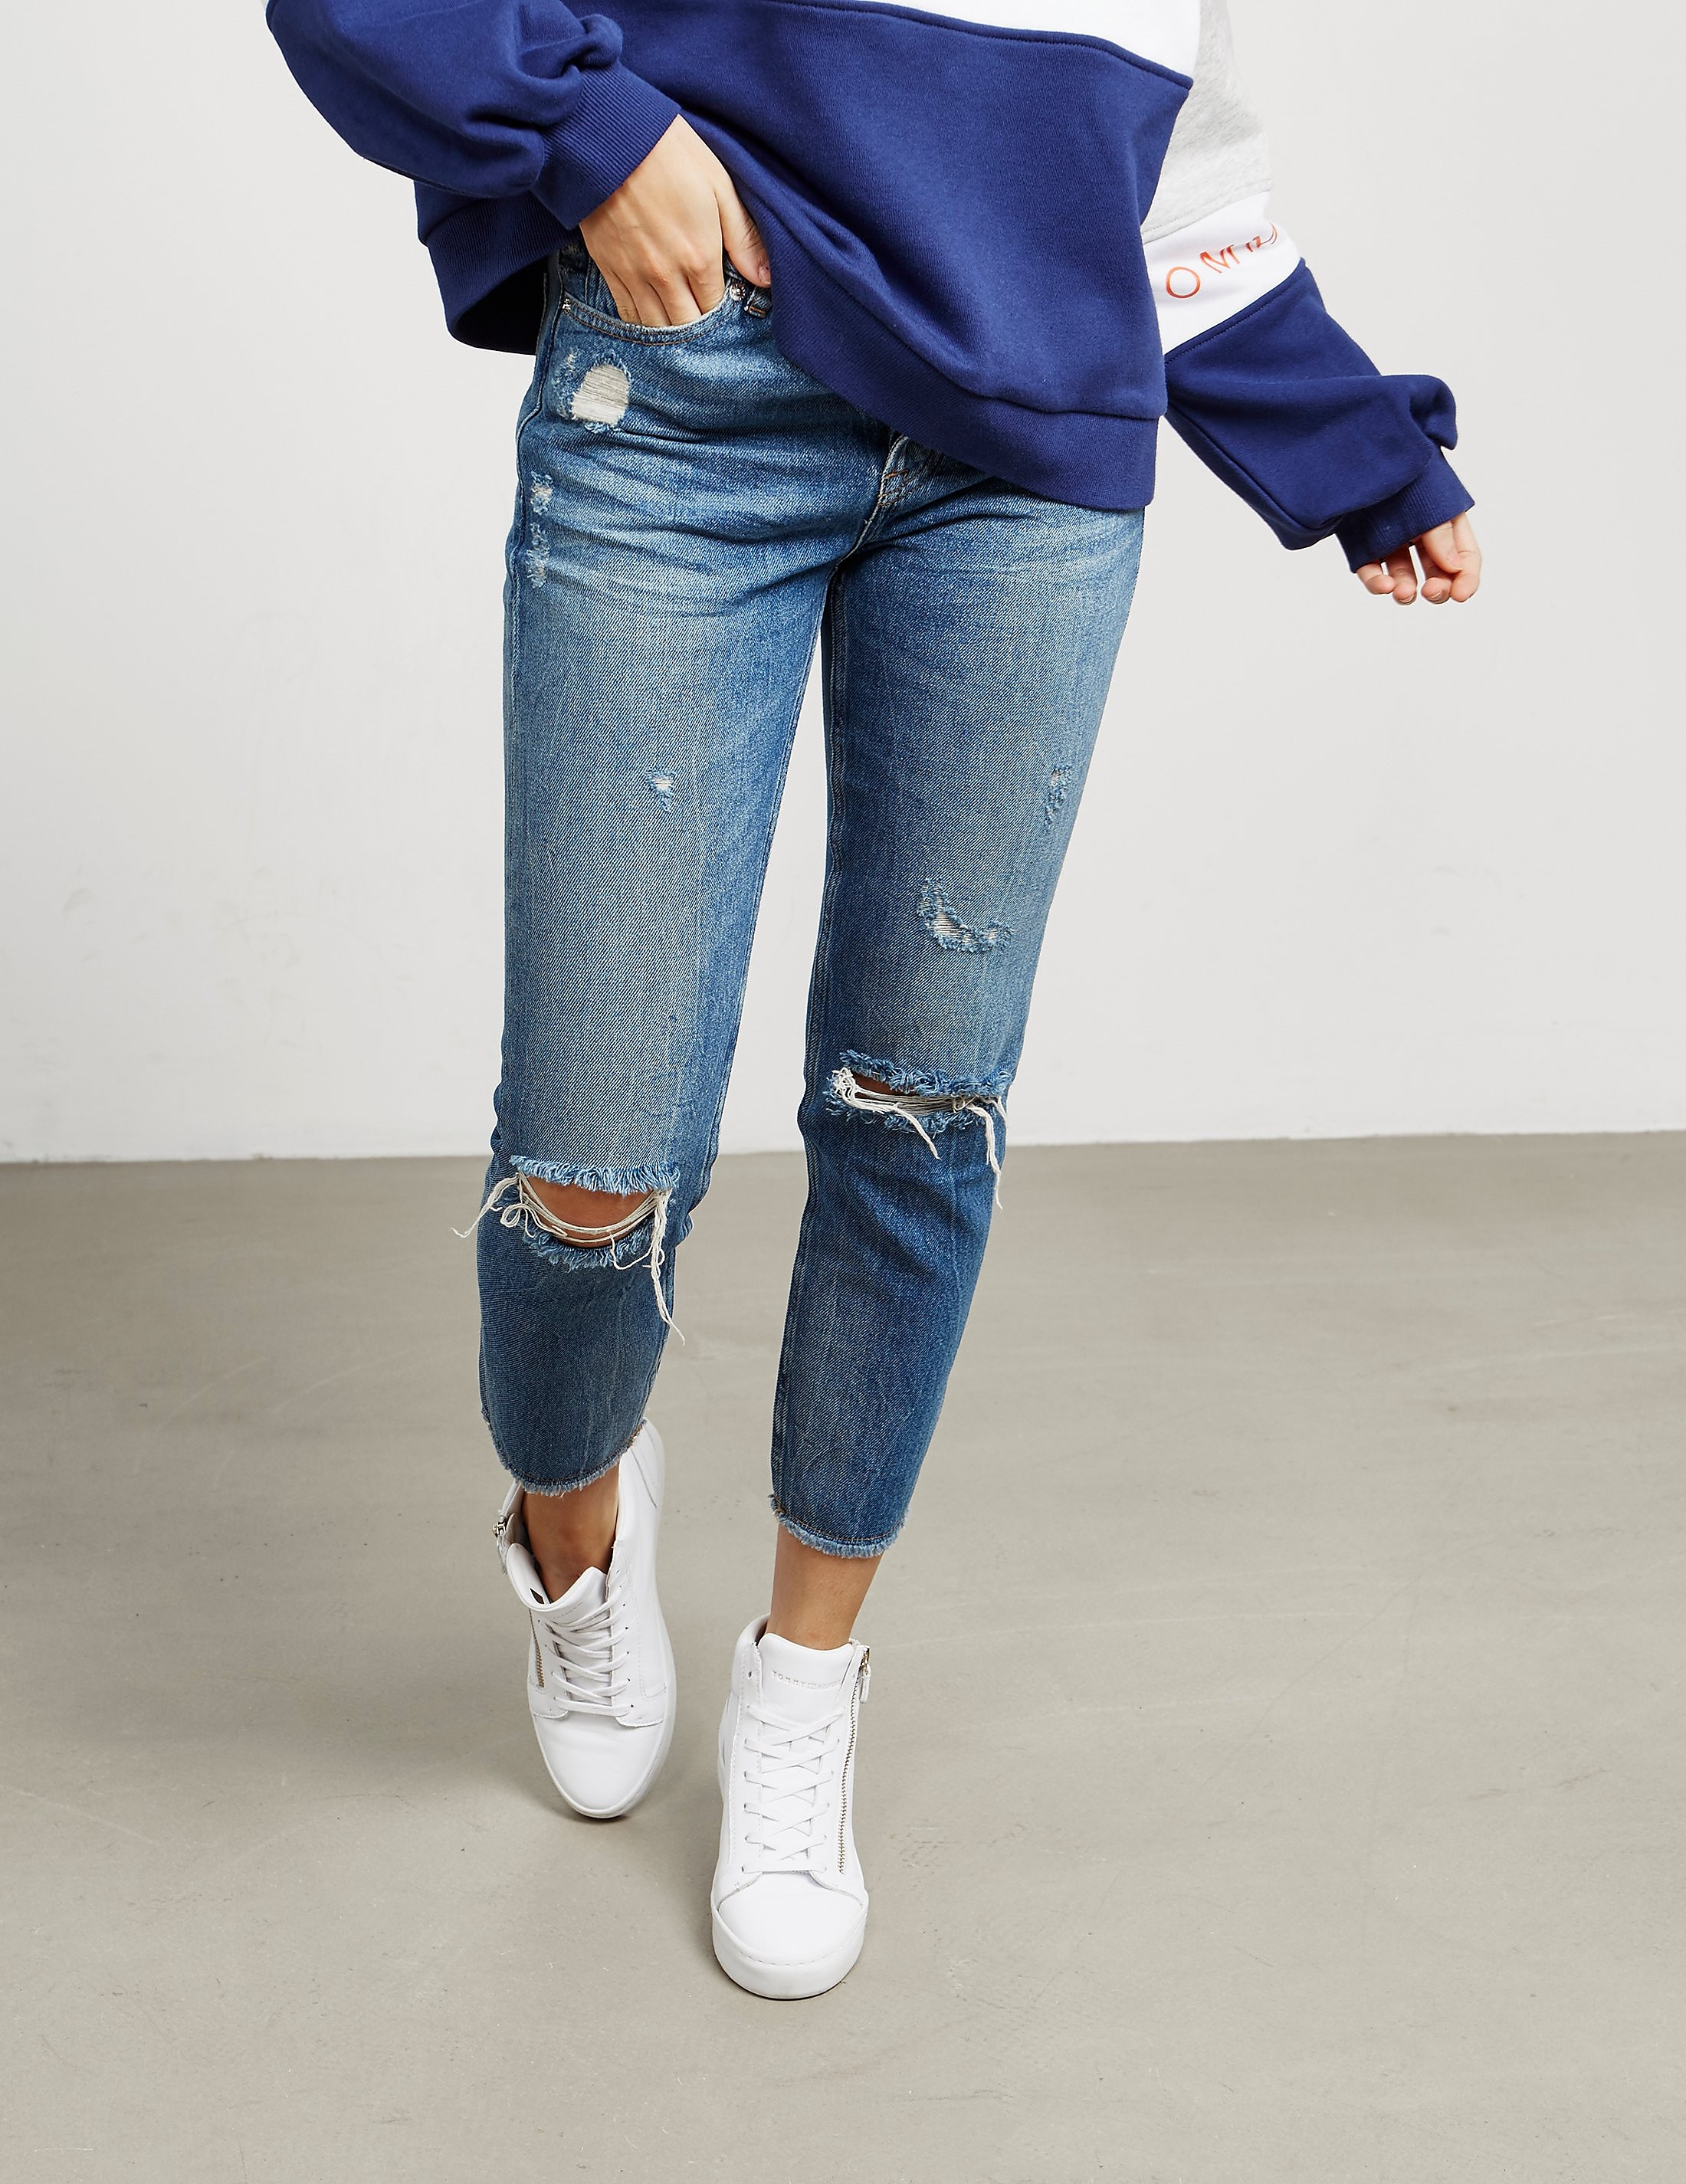 Tommy Hilfiger ZZY Denim Jeans